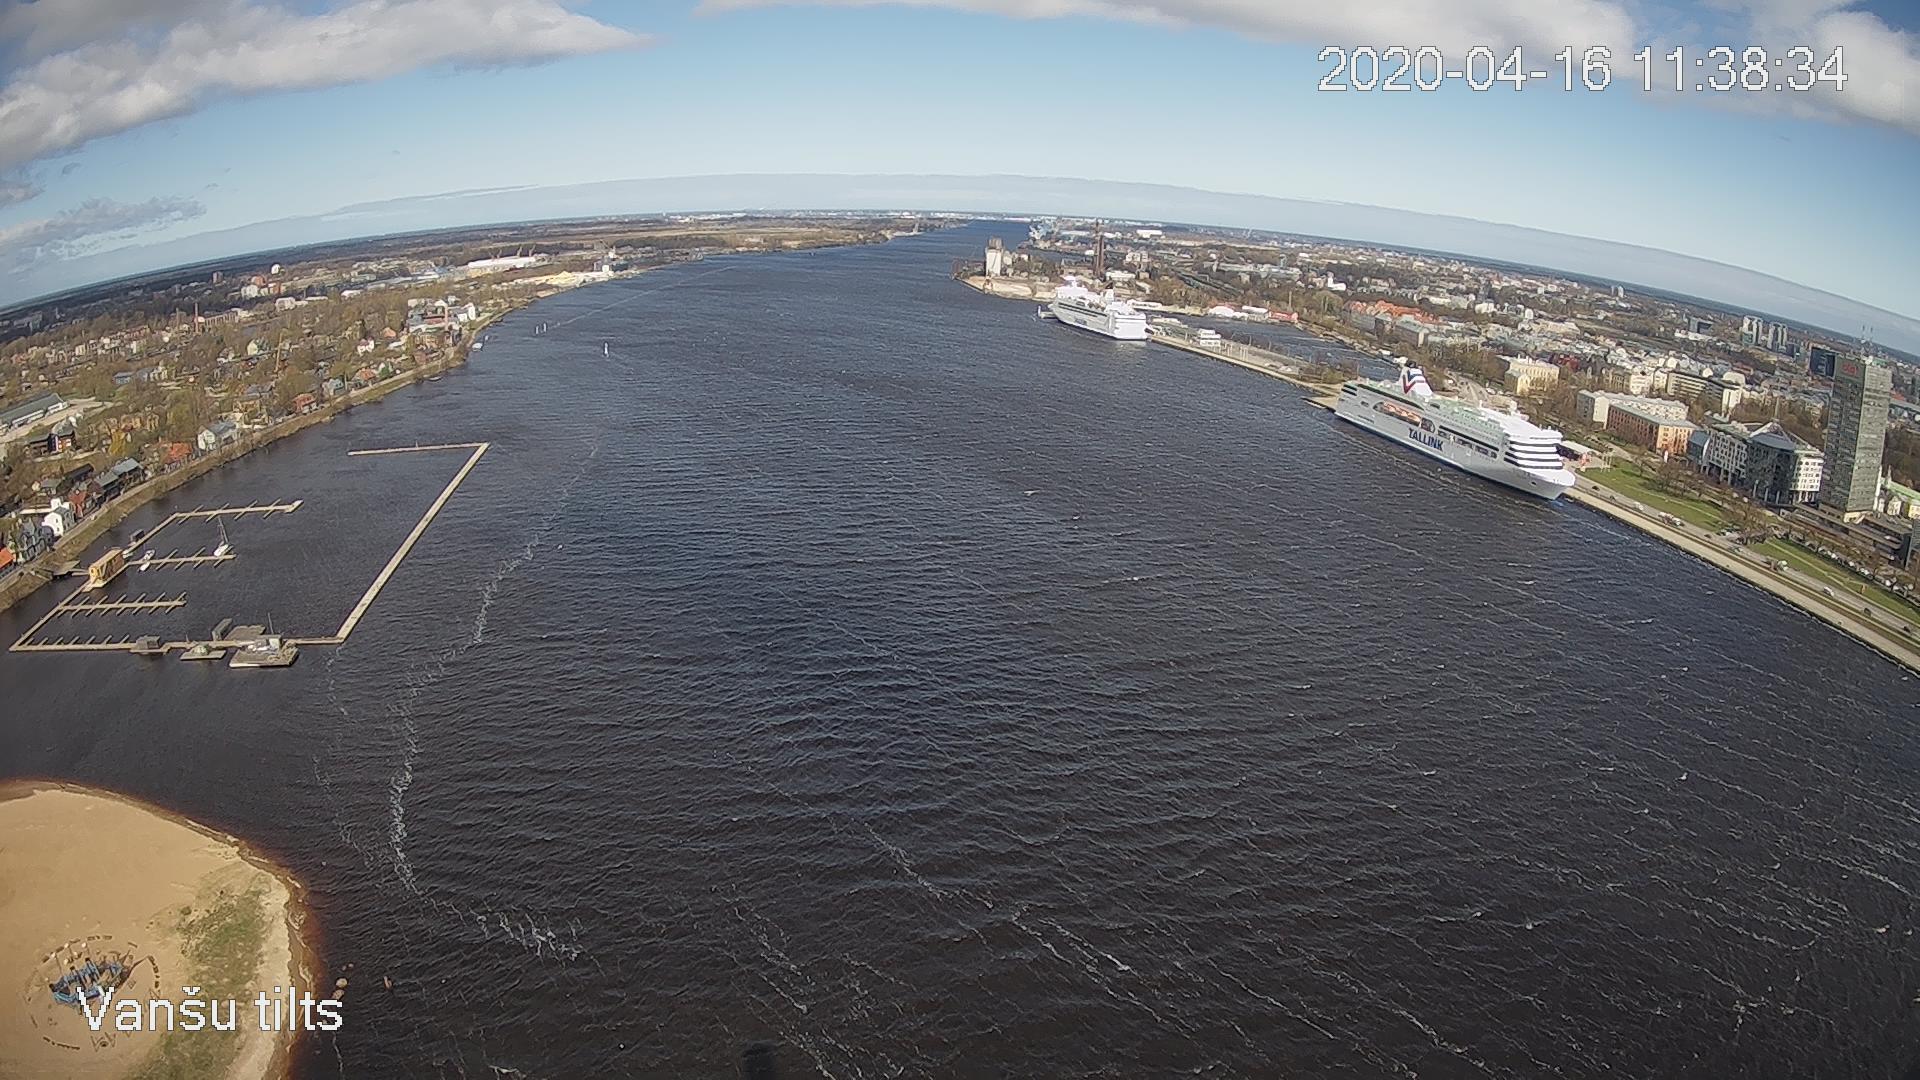 Webkamera Vecrīga: Freeport of Riga